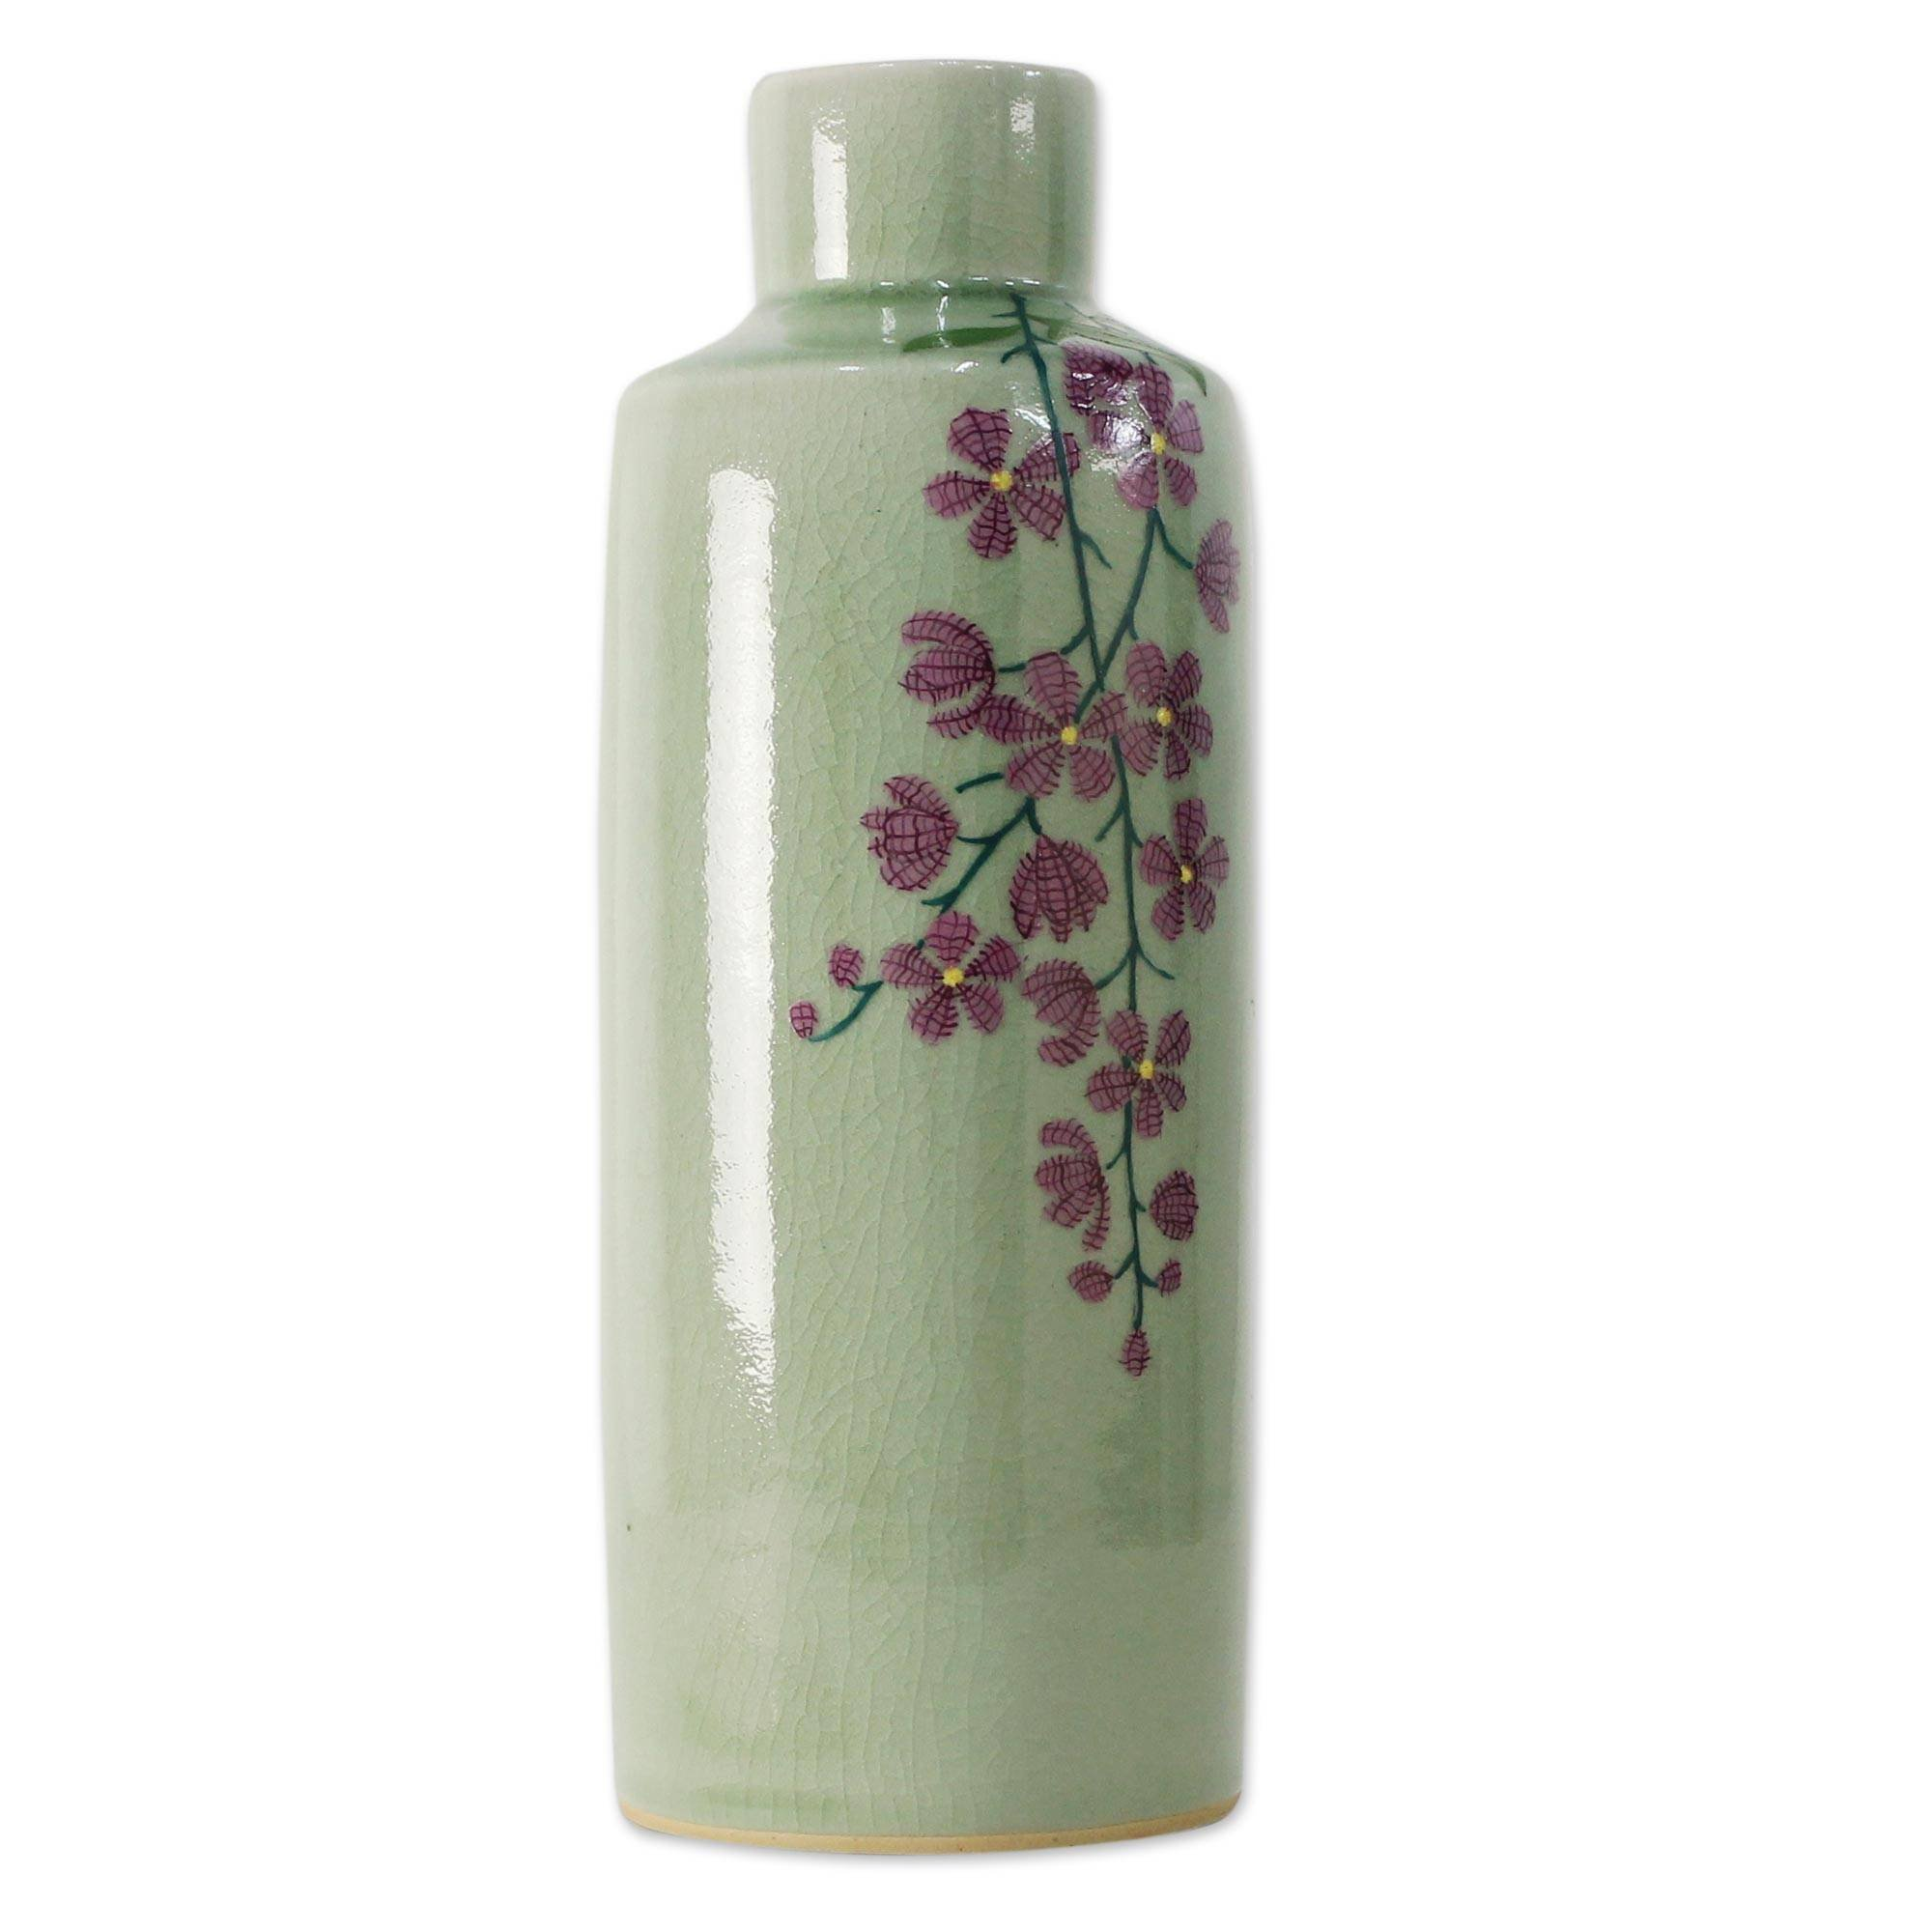 NOVICA Decorative Celadon Ceramic Vase, Green and Pink, 'Around The Garden' by NOVICA